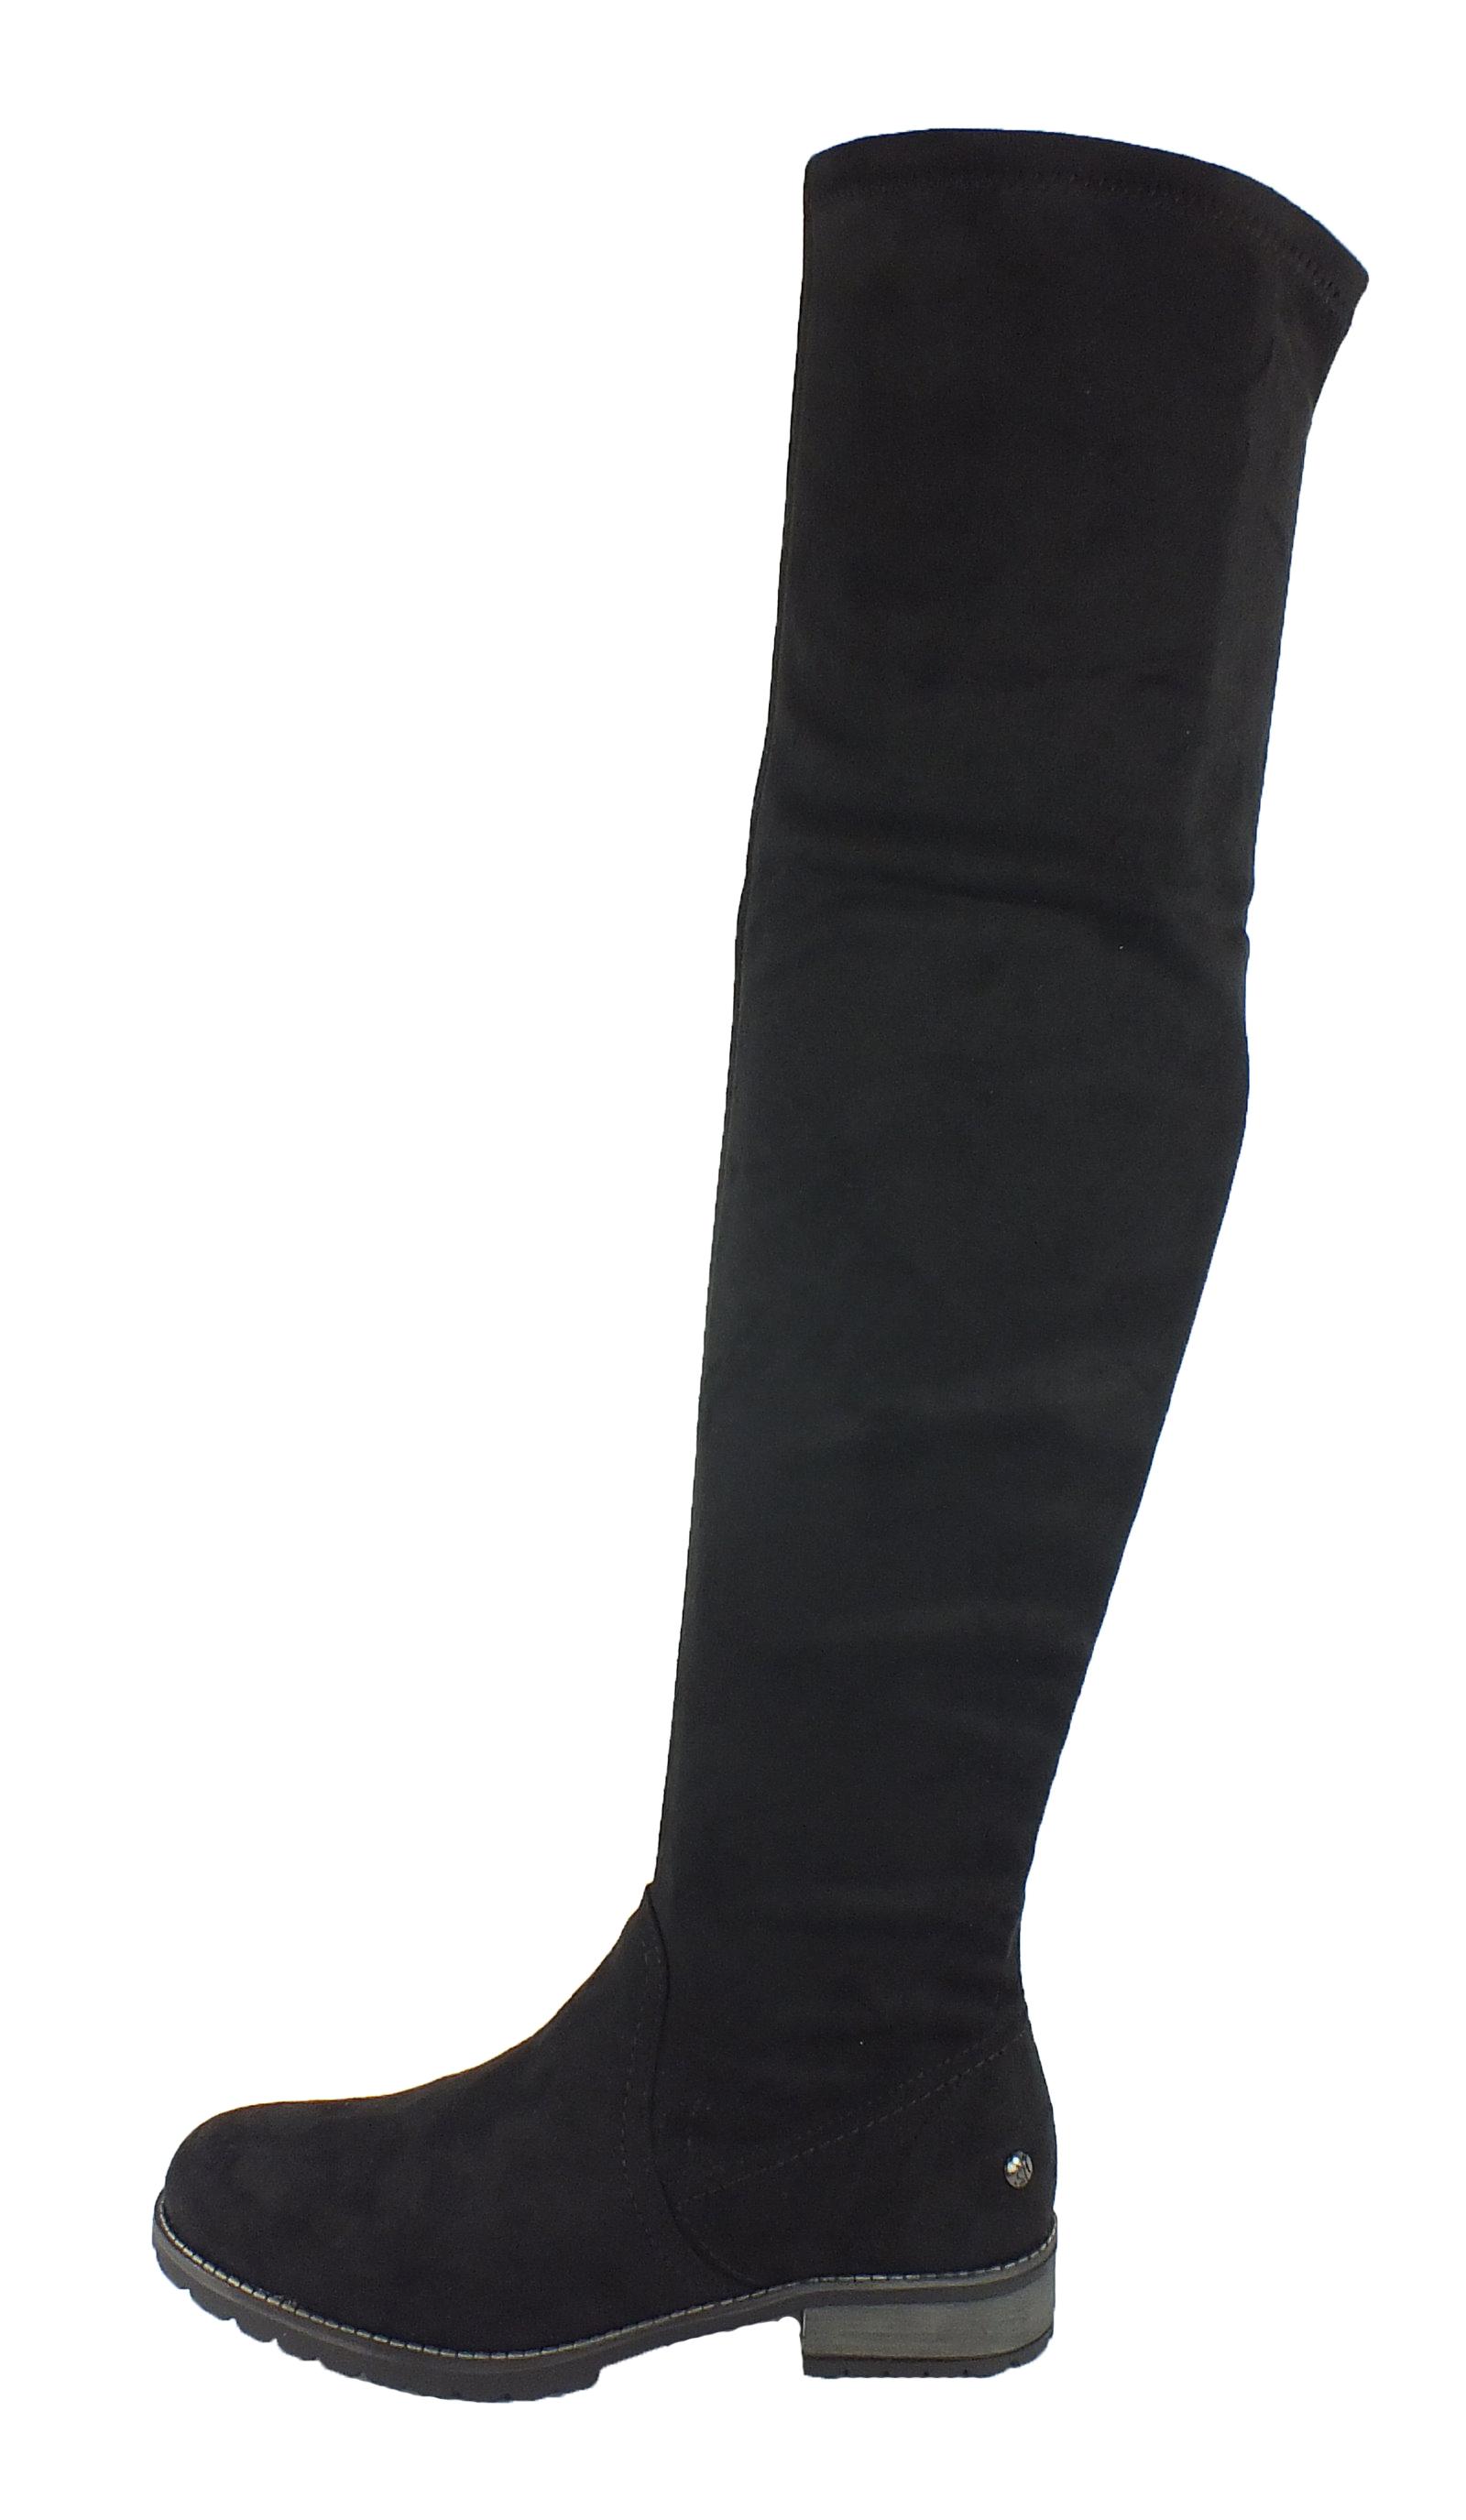 s.Oliver Overknee stretch Overknee Stiefel Taupe 10183